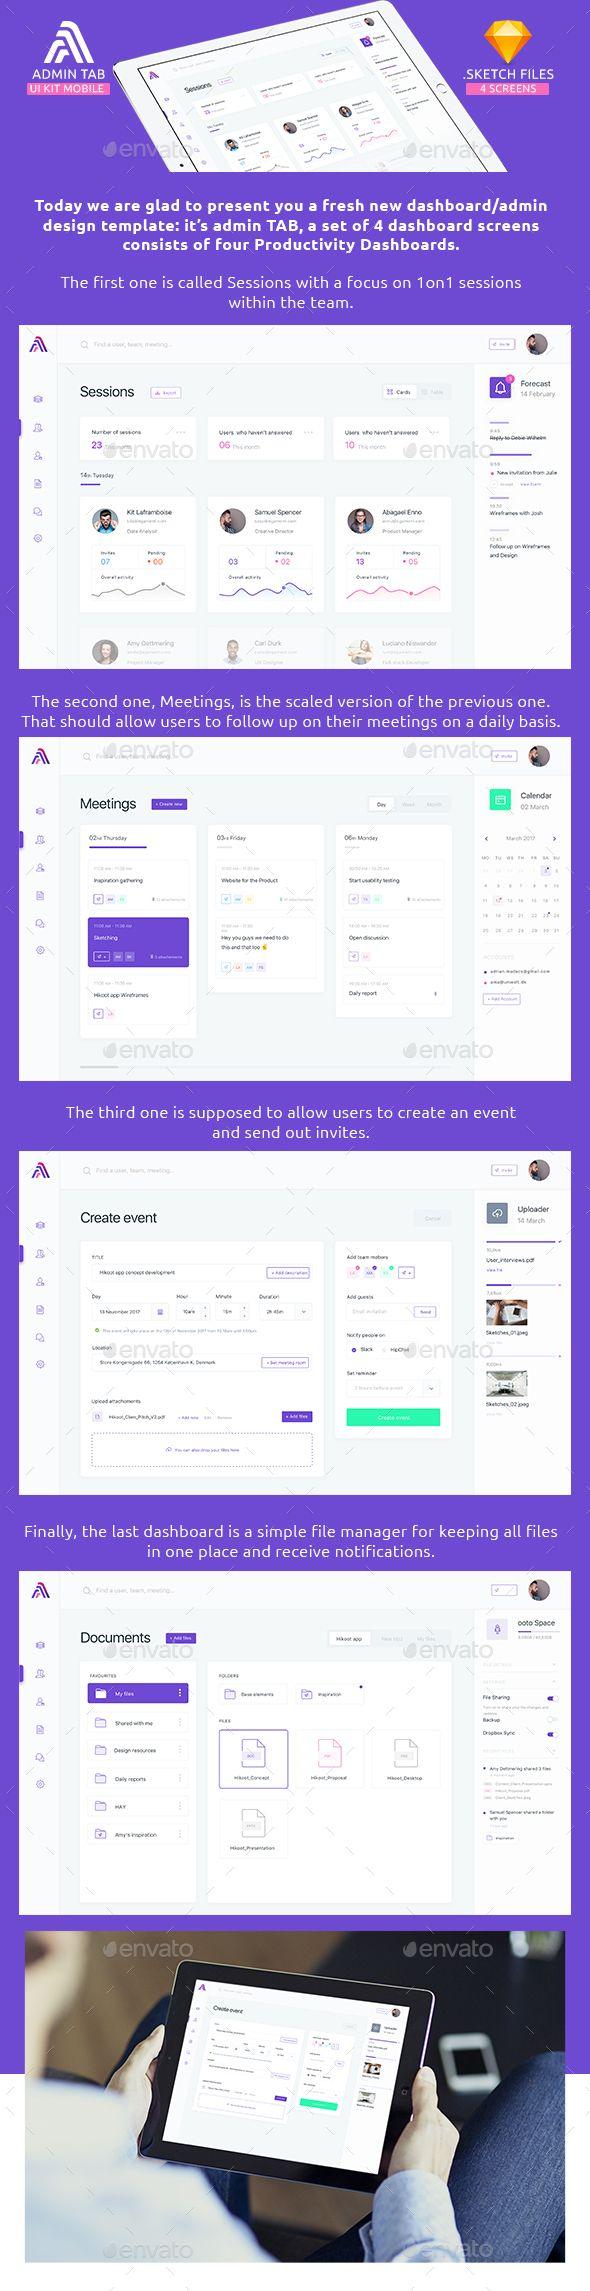 423 best UI UX design images on Pinterest | Ui kit, User interface ...